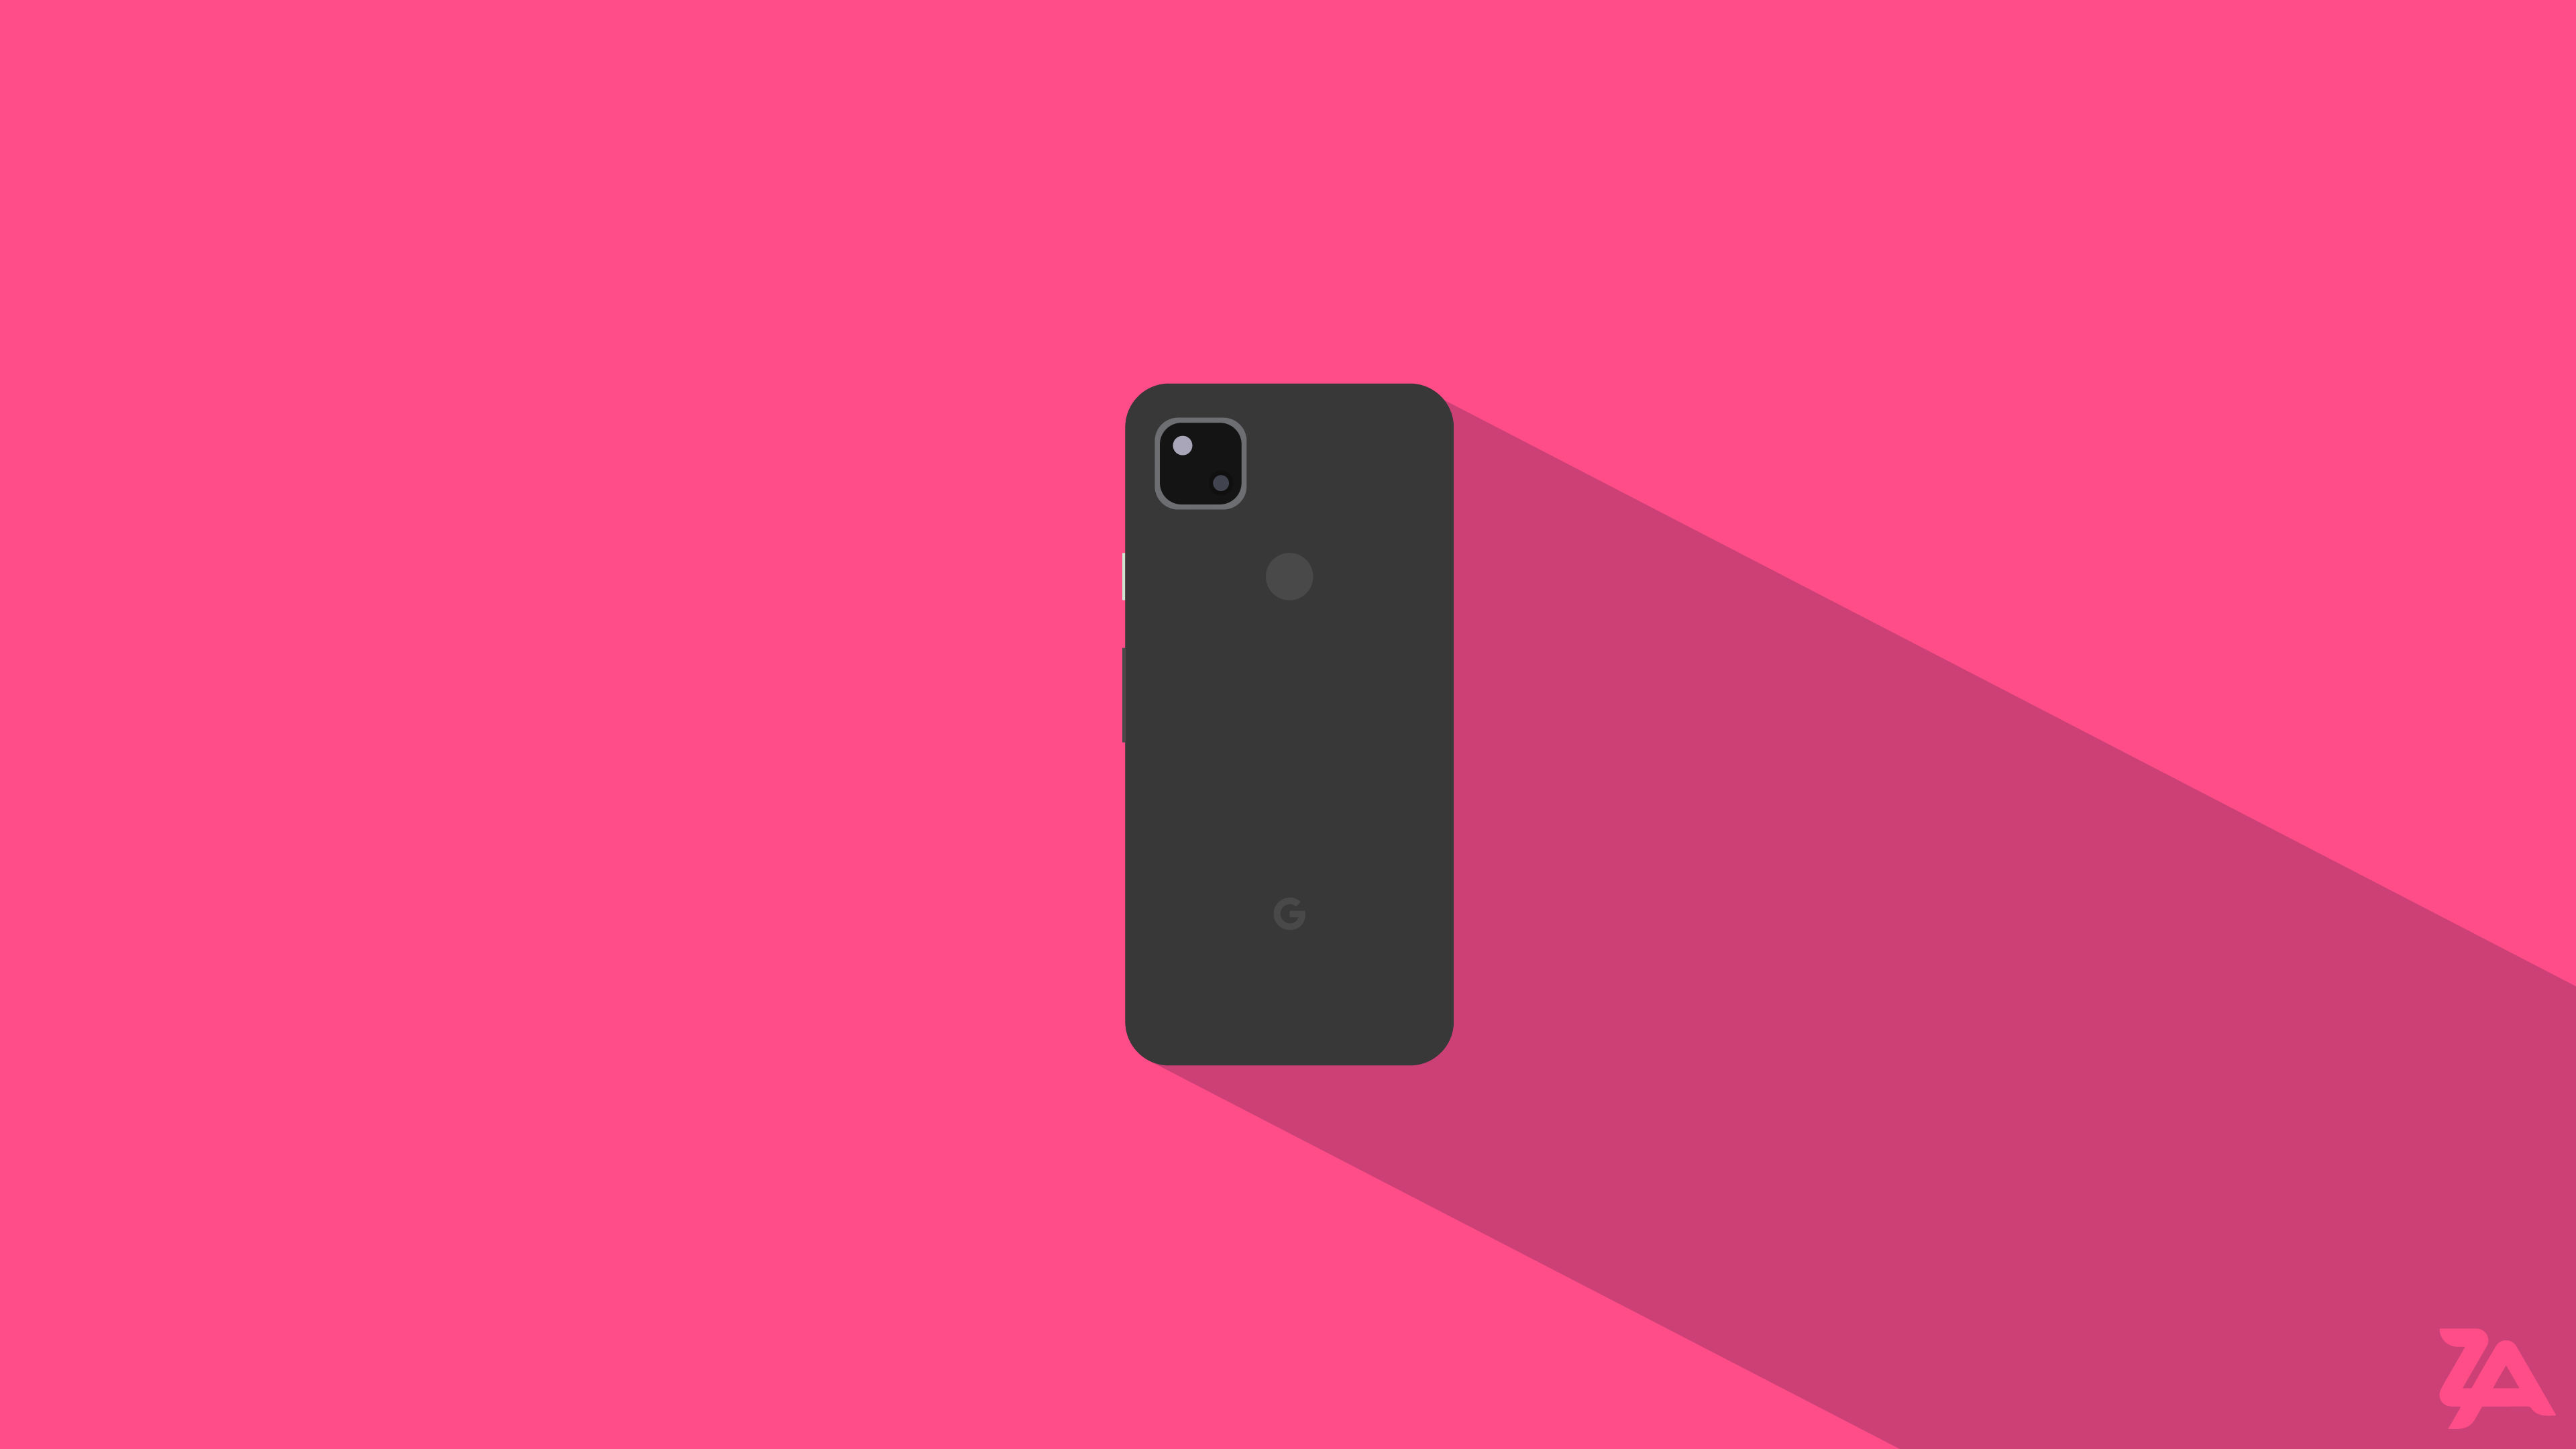 General 3840x2160 cell phone smartphone Adobe illustration digital art 2K Google pixel 4a google pixel pink background technology CGI simple background pink